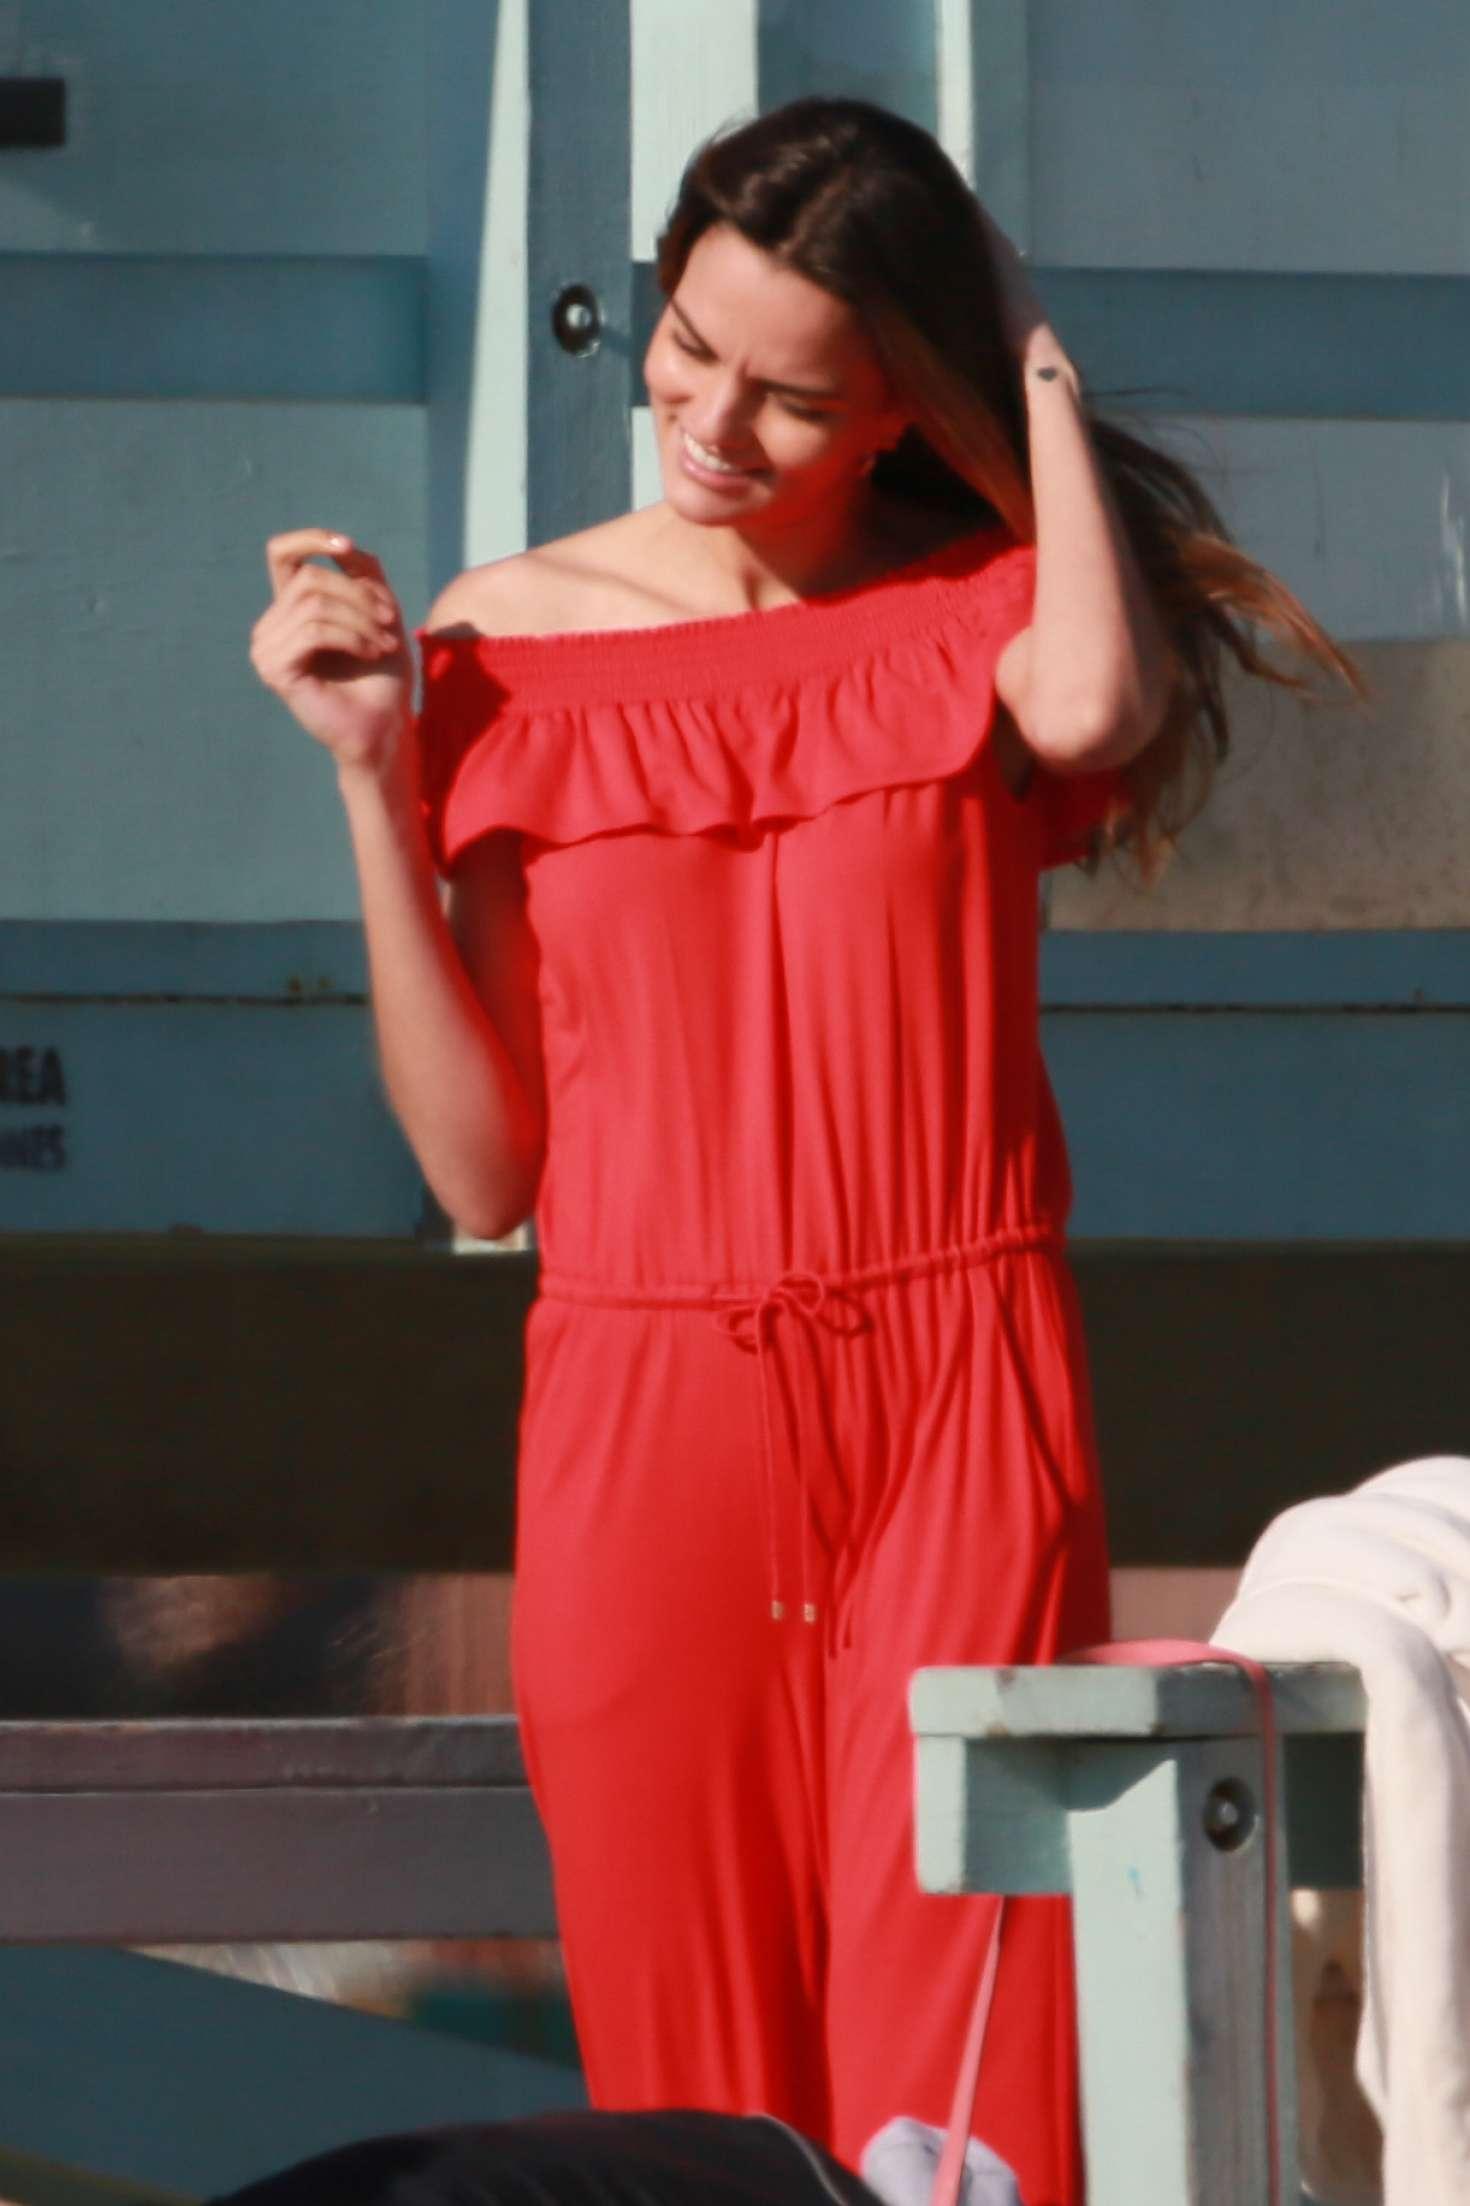 Barbara Fialho - Photoshoot a Tommy Hilfiger campaign on Venice Beach